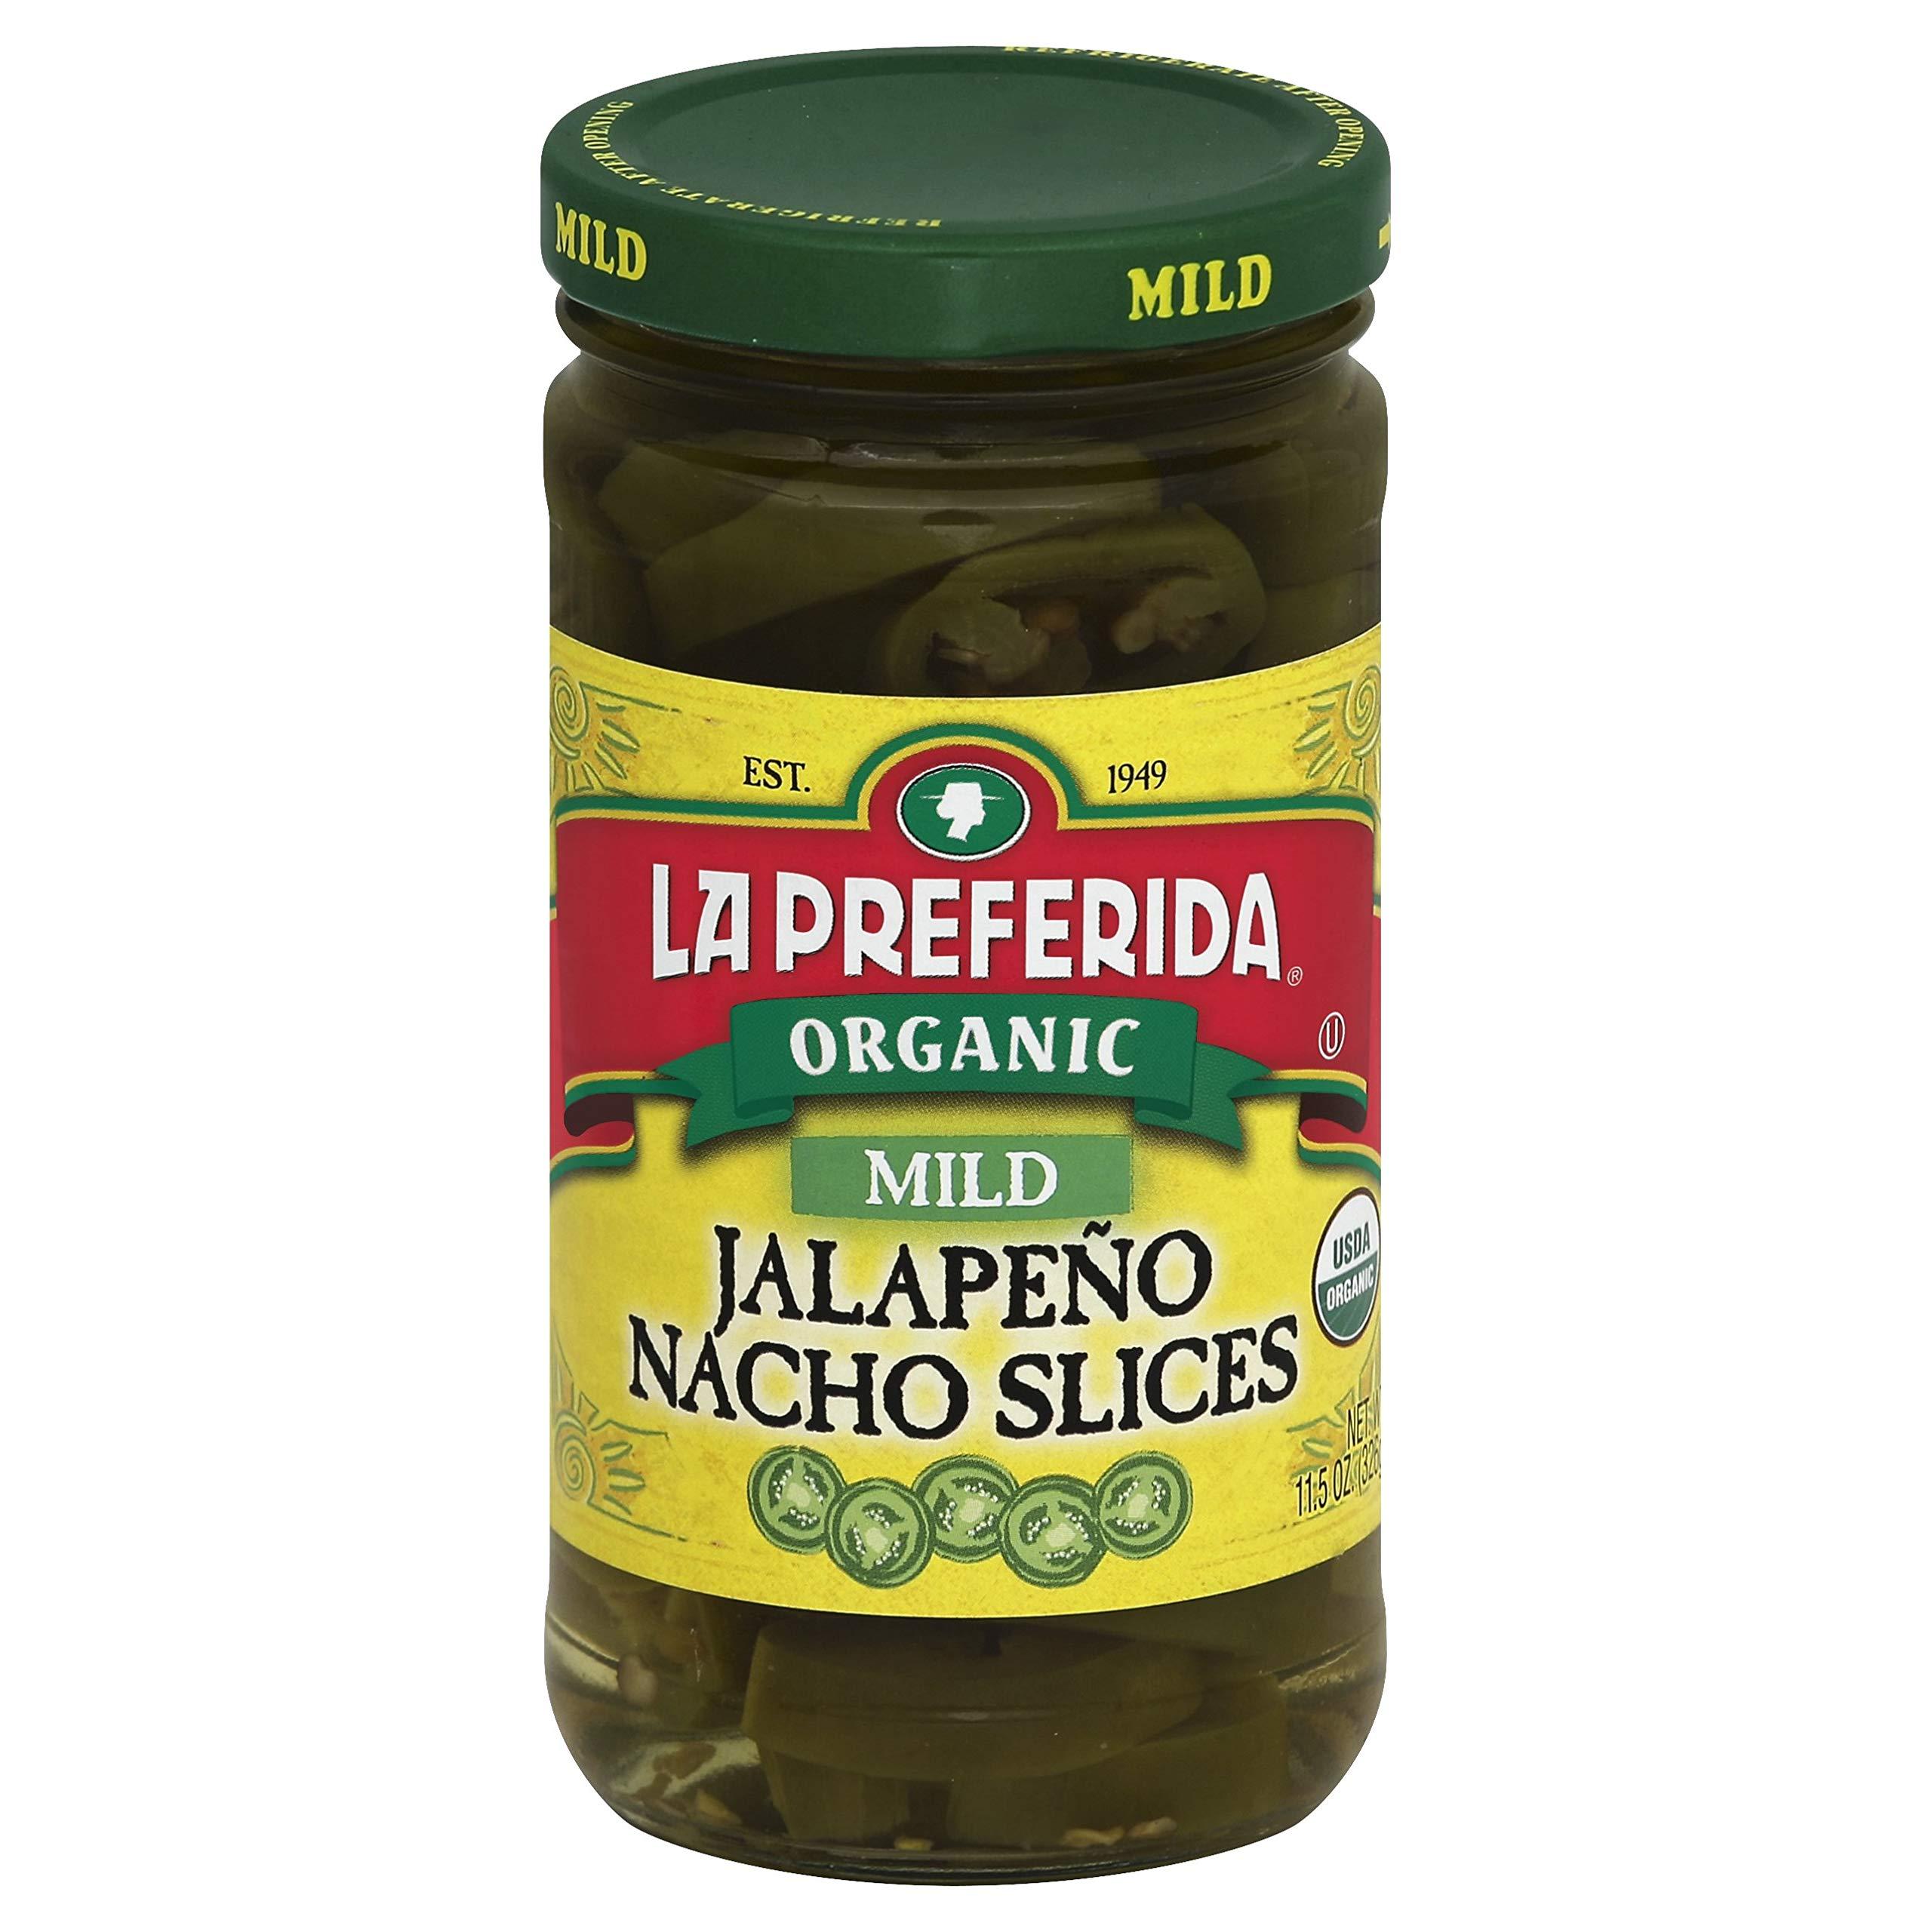 La Preferida Organic Jalapeno Nacho Slices, Mild, 11.5 oz (Pack - 6)